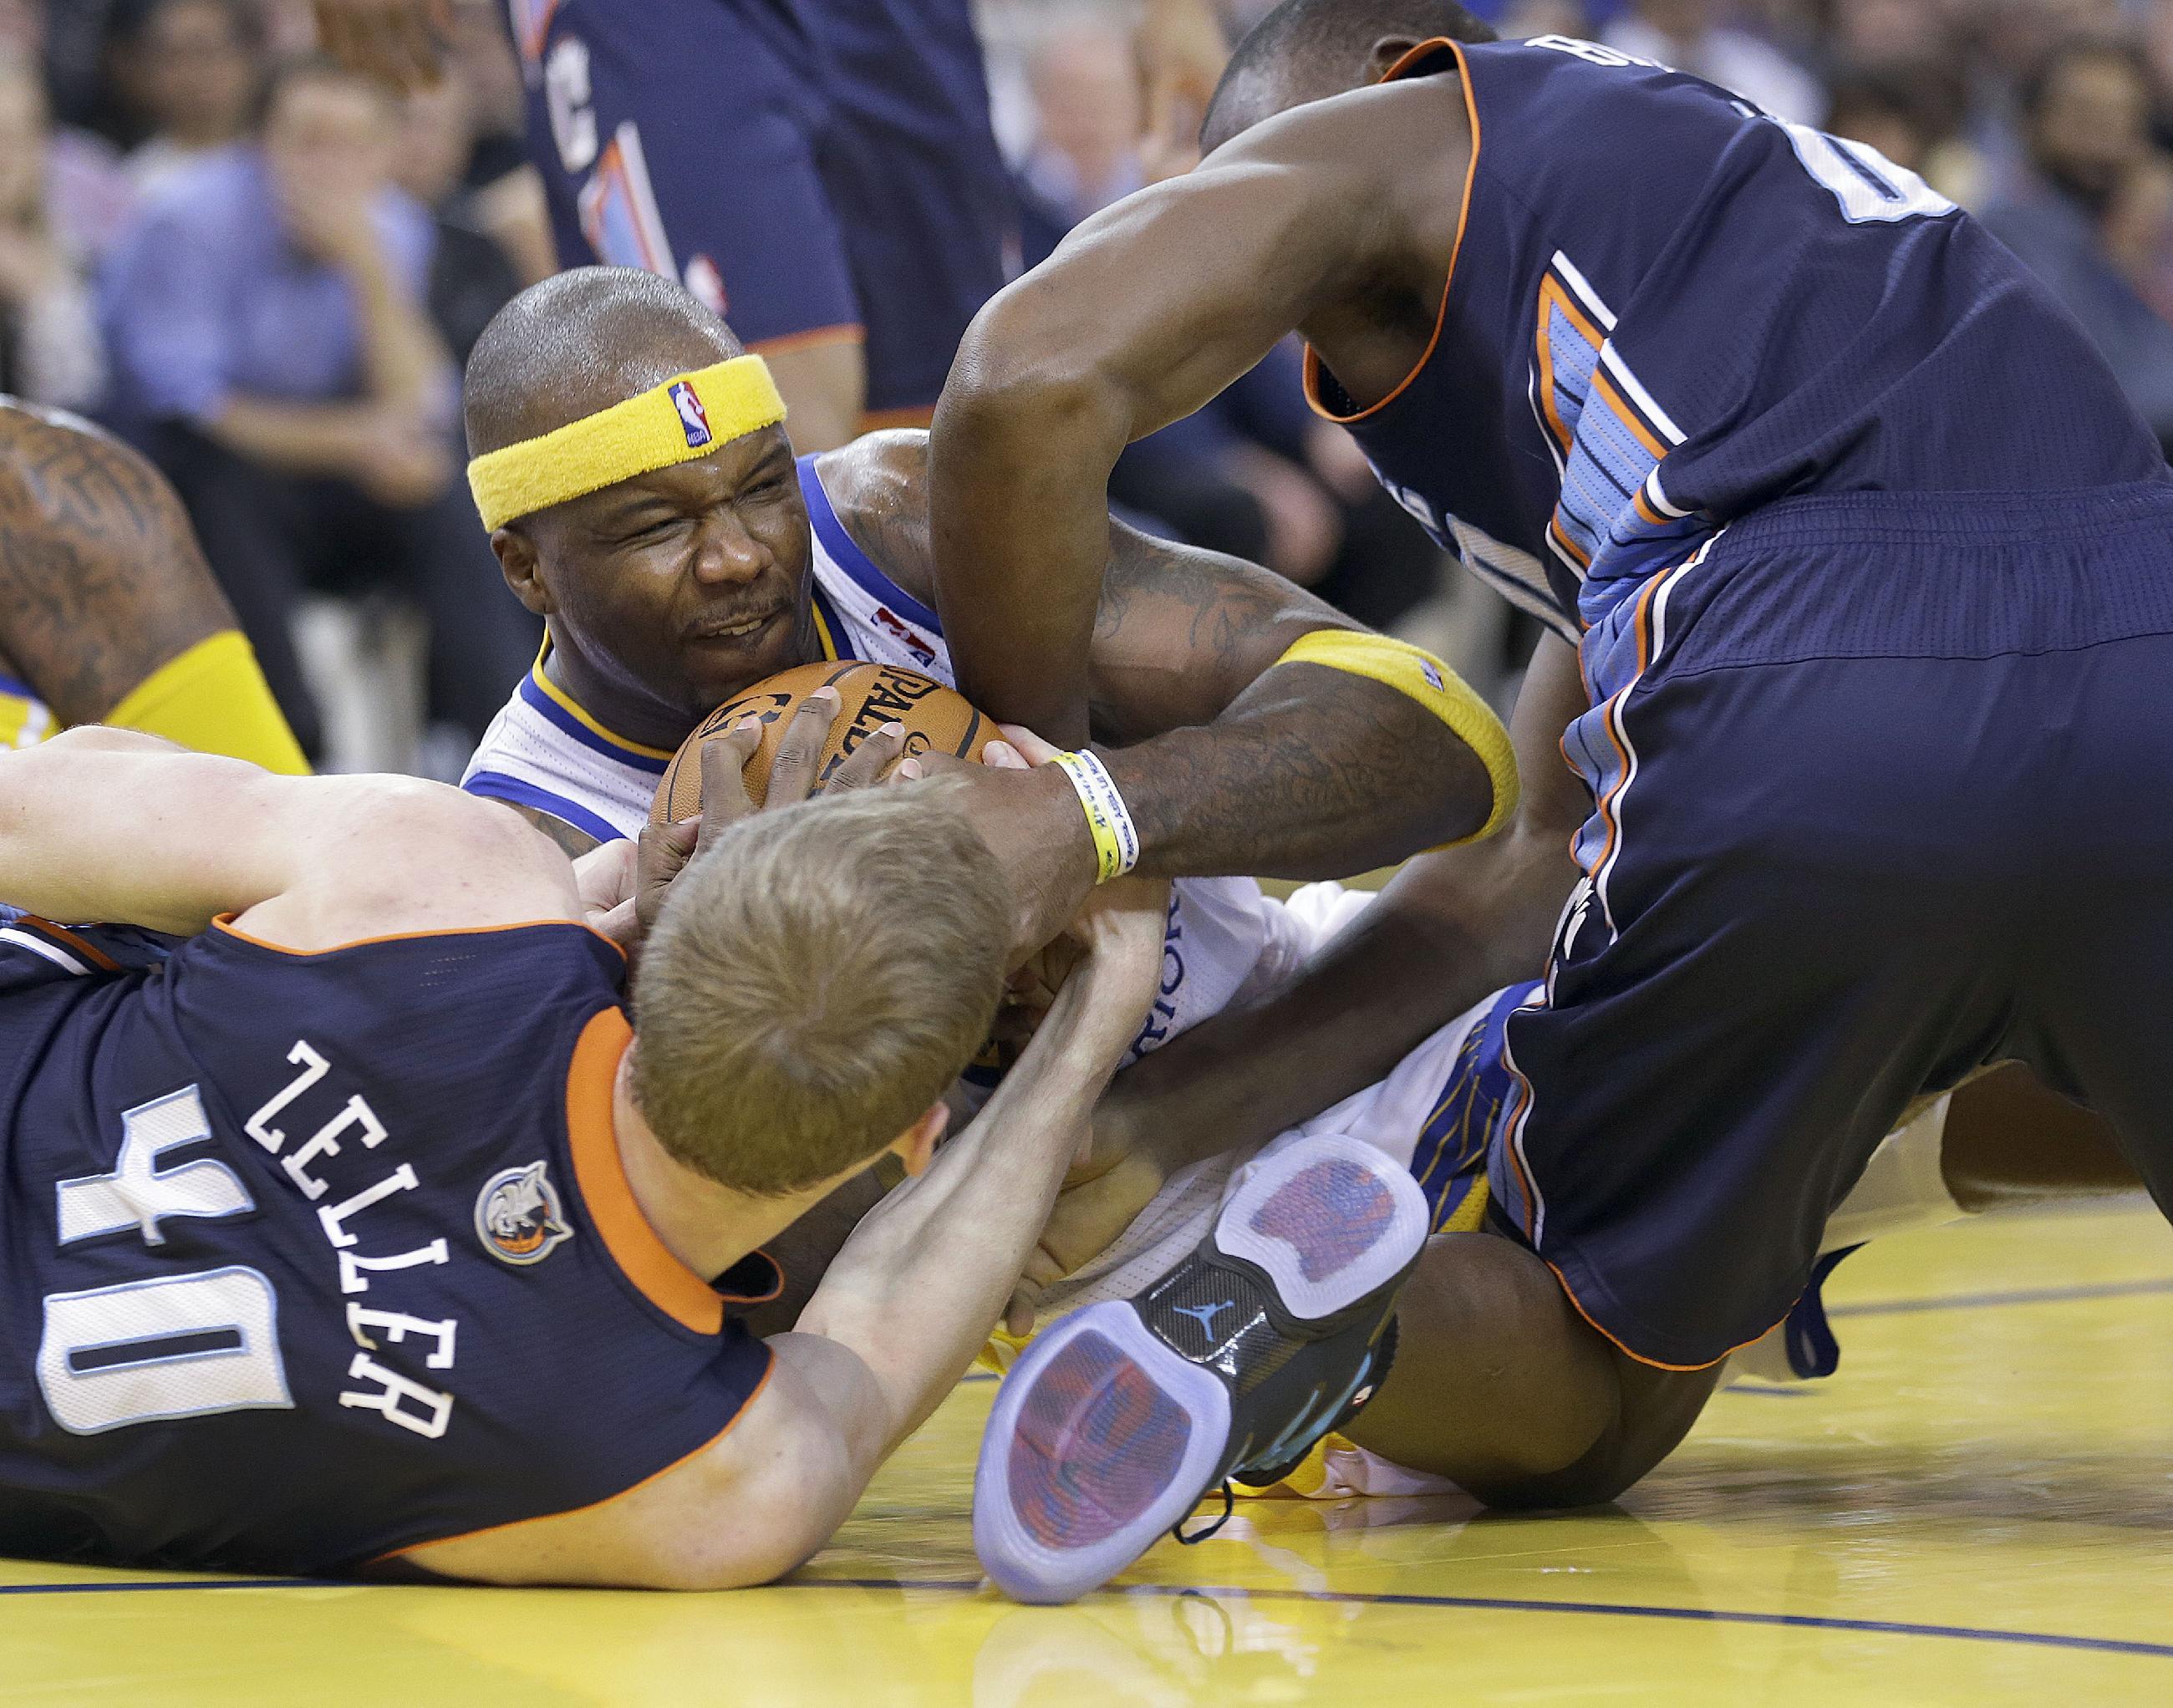 Bobcats blow out Warriors 91-75 in Walker's return